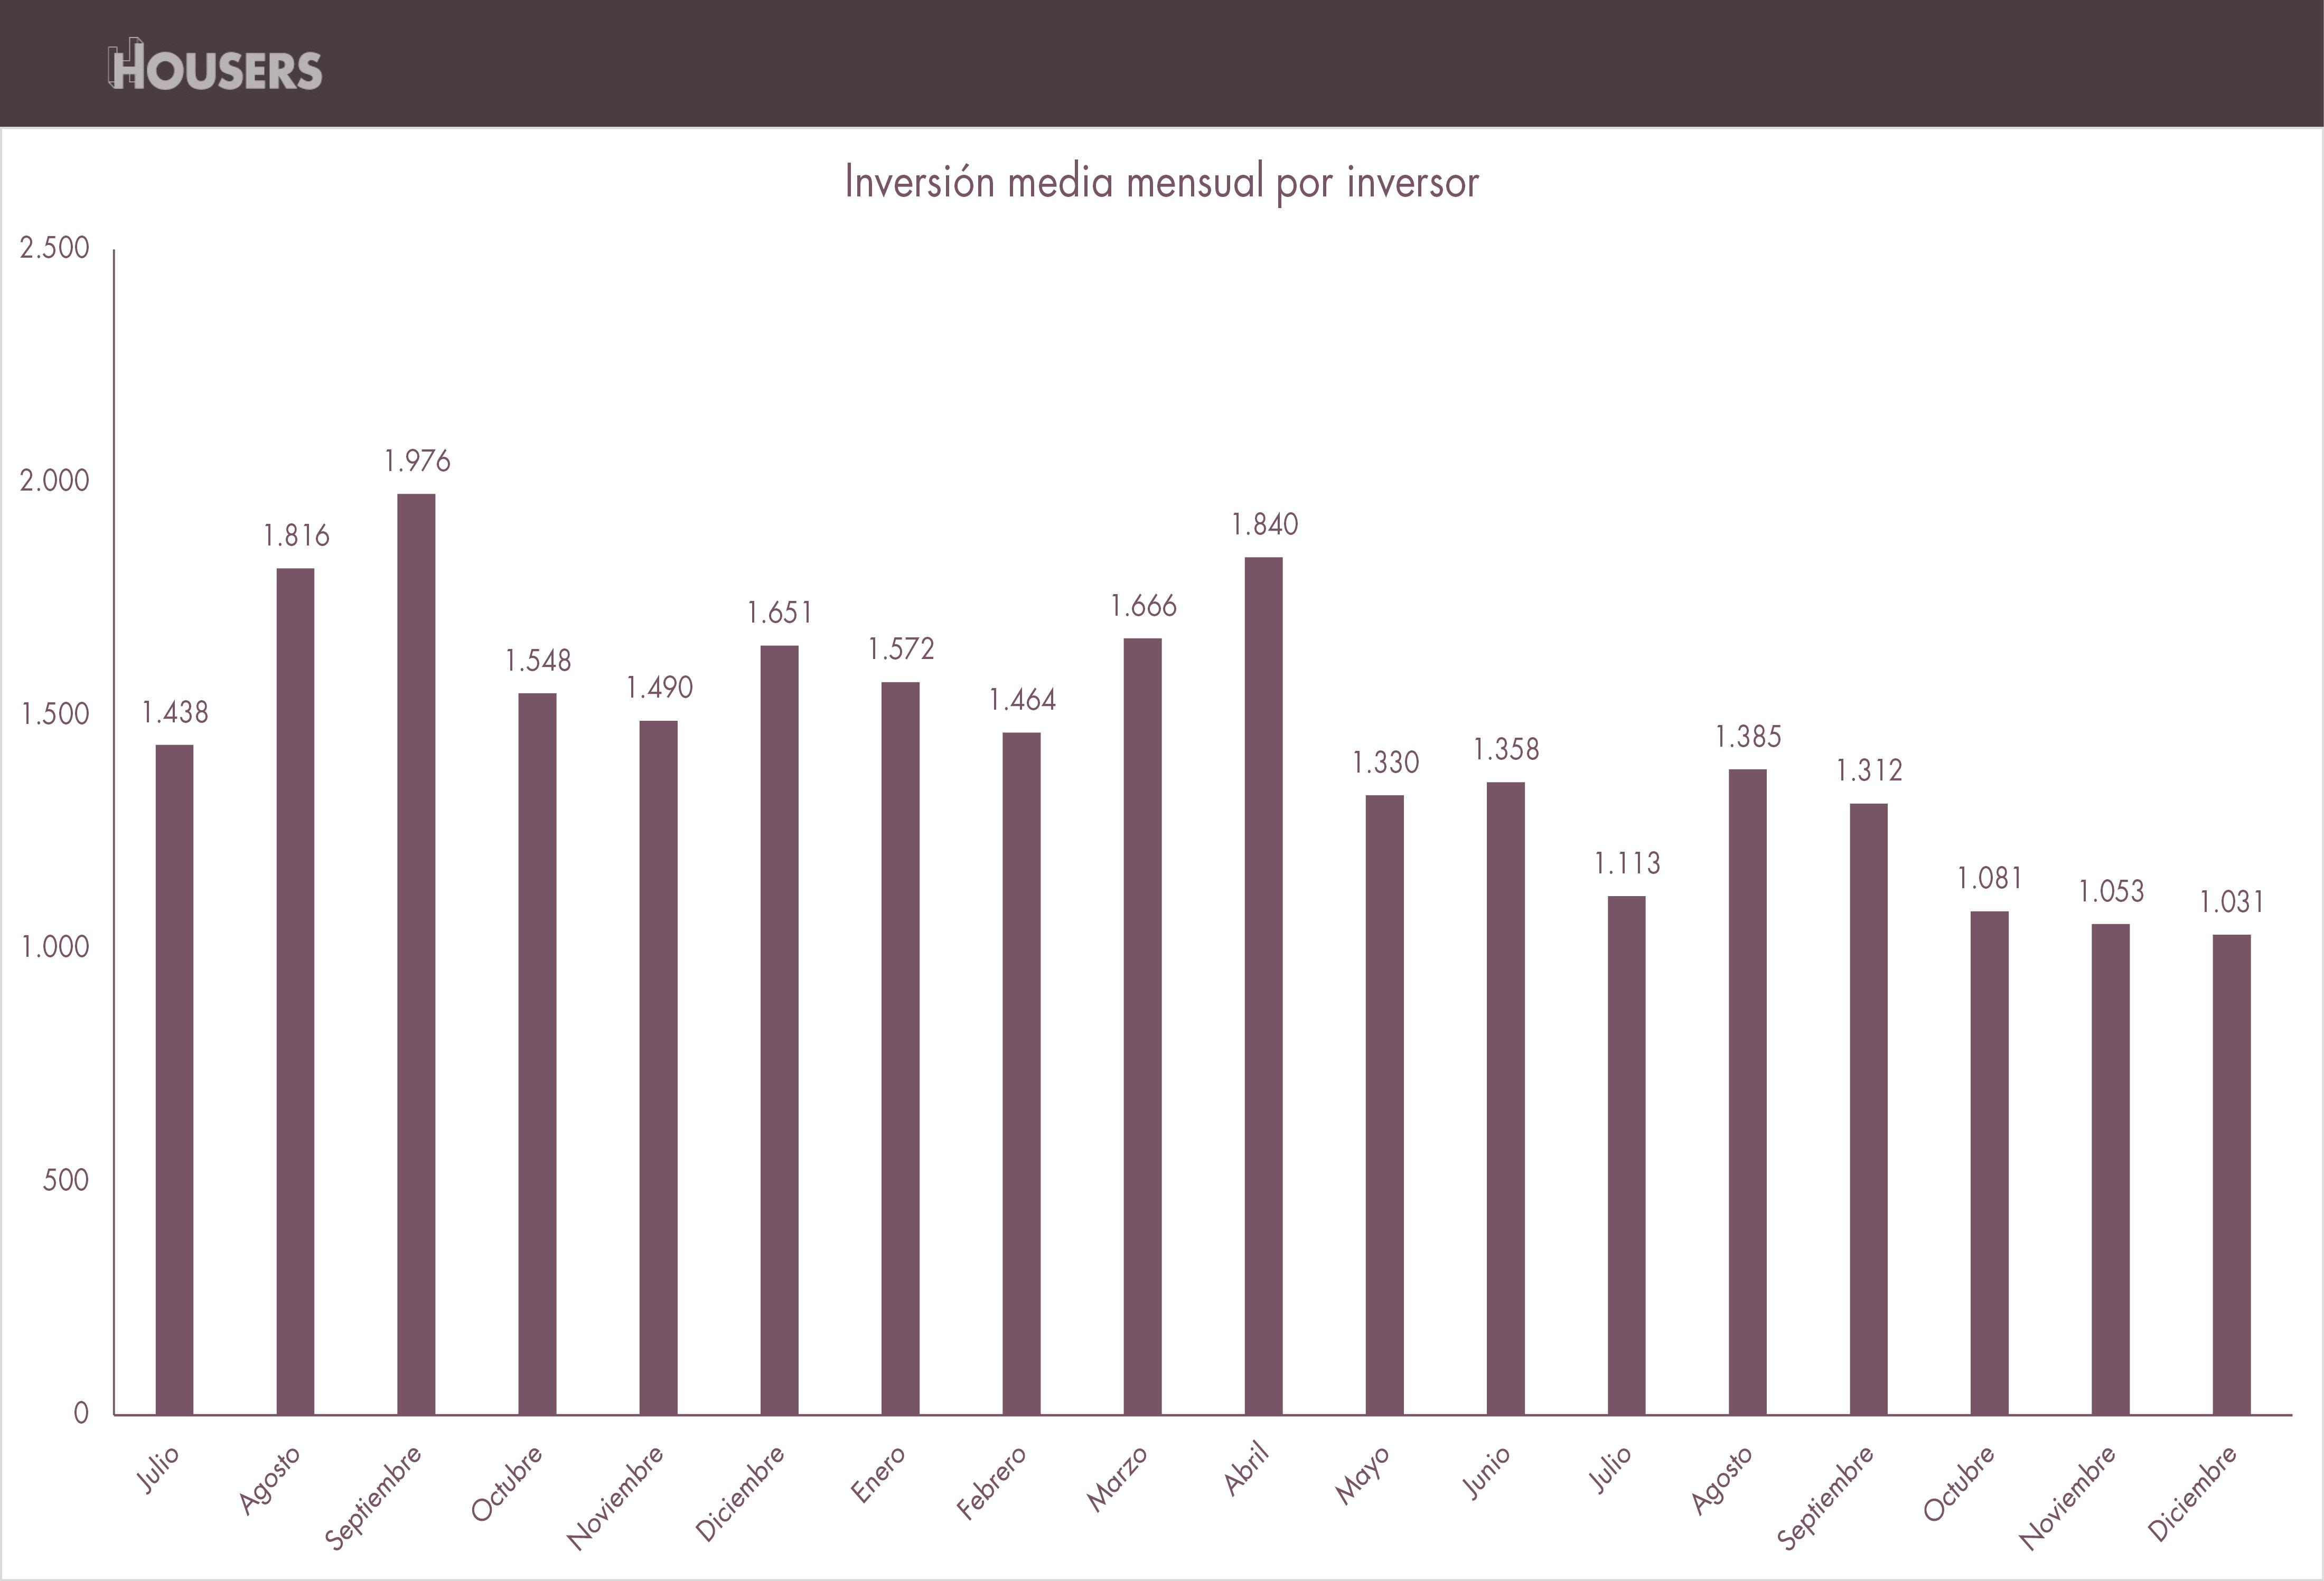 datos housers diciembre 2016 inversion media mensual por inversor